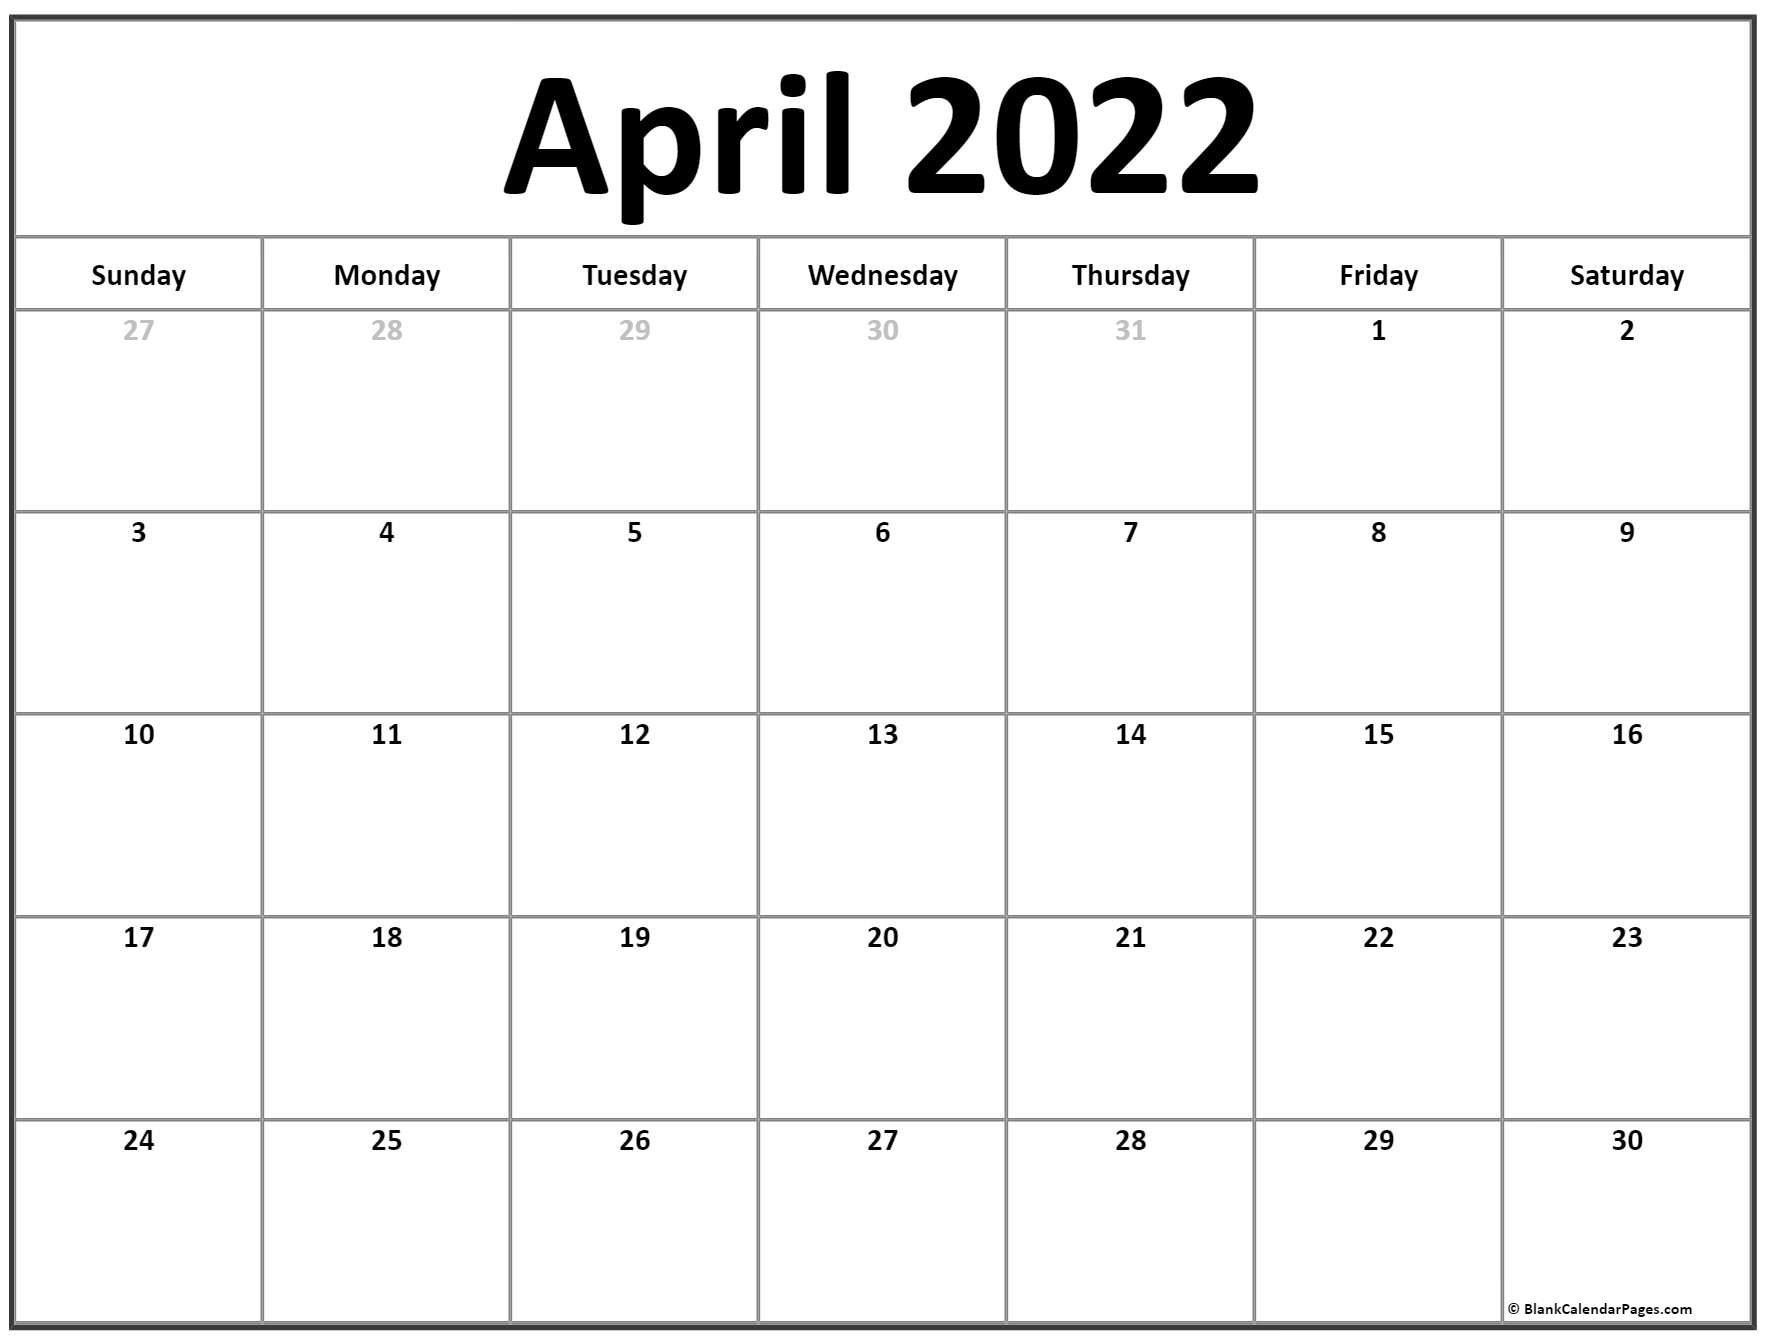 April 2022 Calendar | Free Printable Calendar Templates pertaining to April 2022 Calendar Printable Images